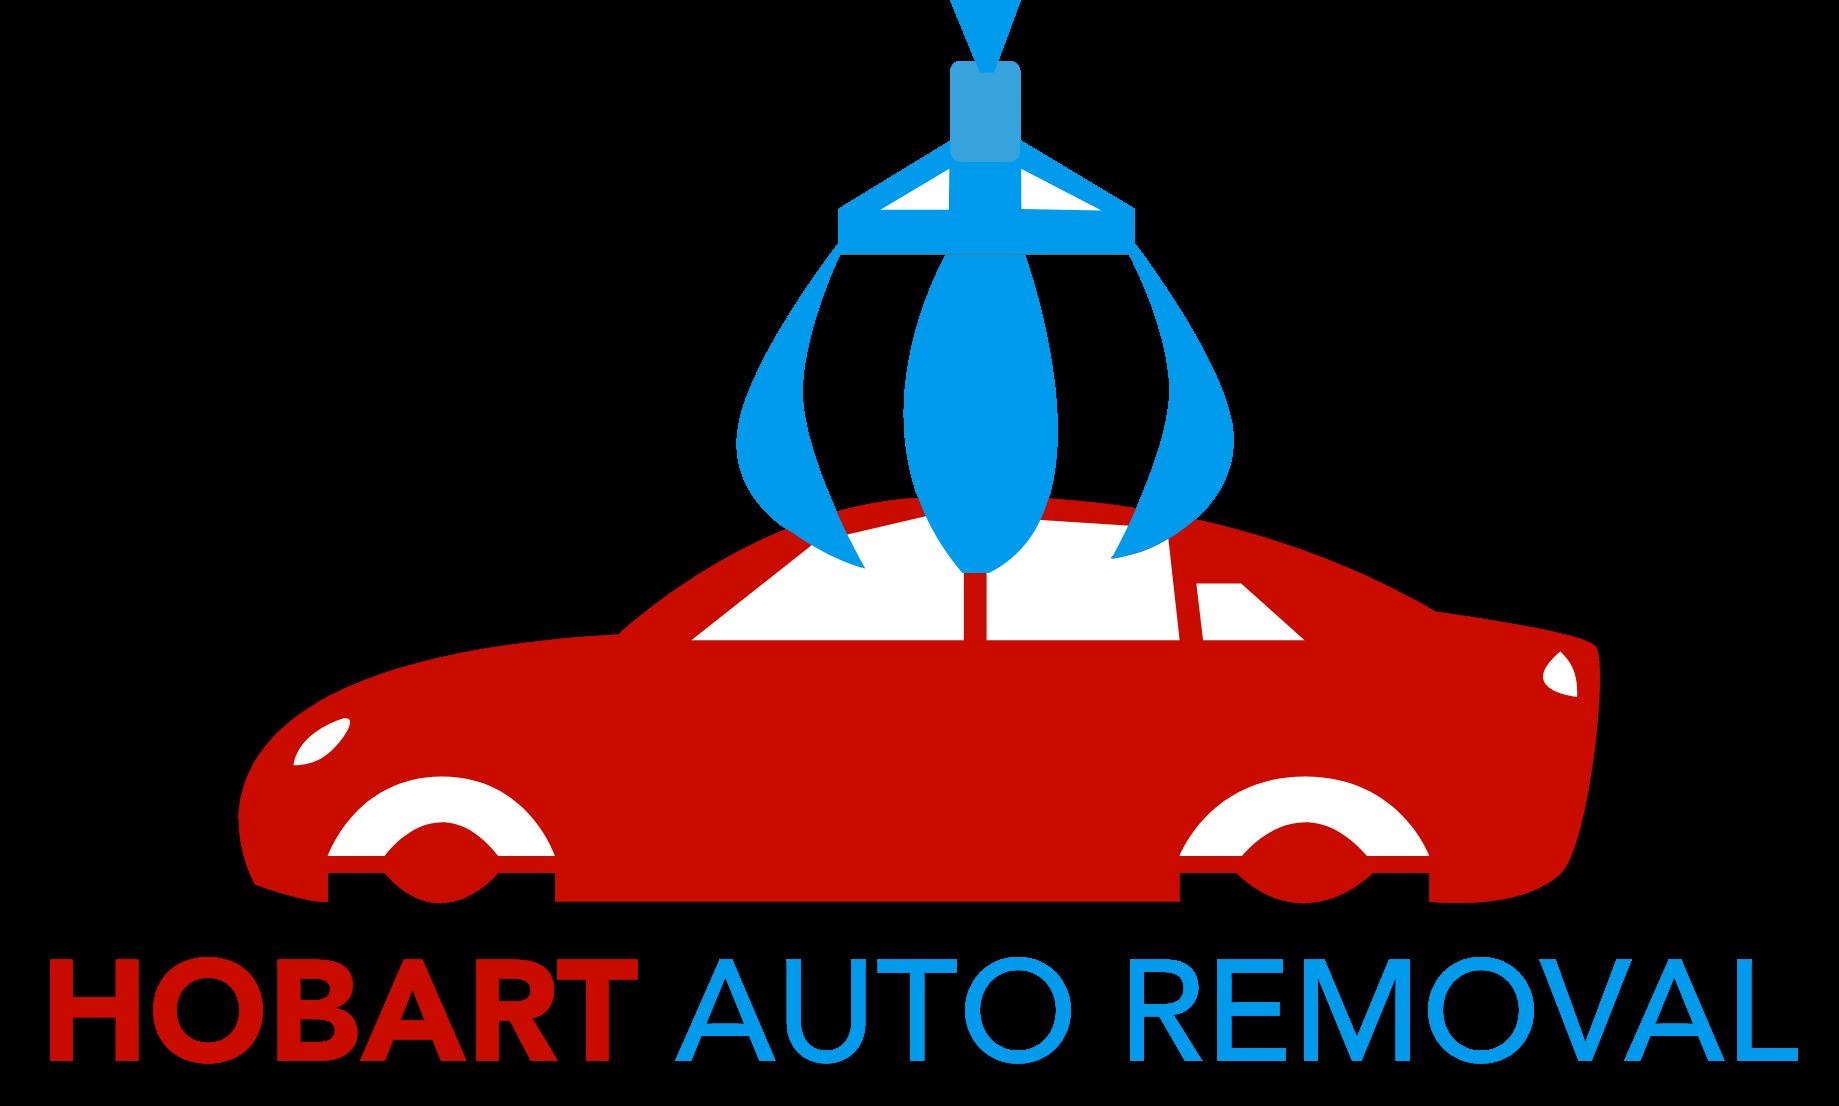 Car Removal Hobart